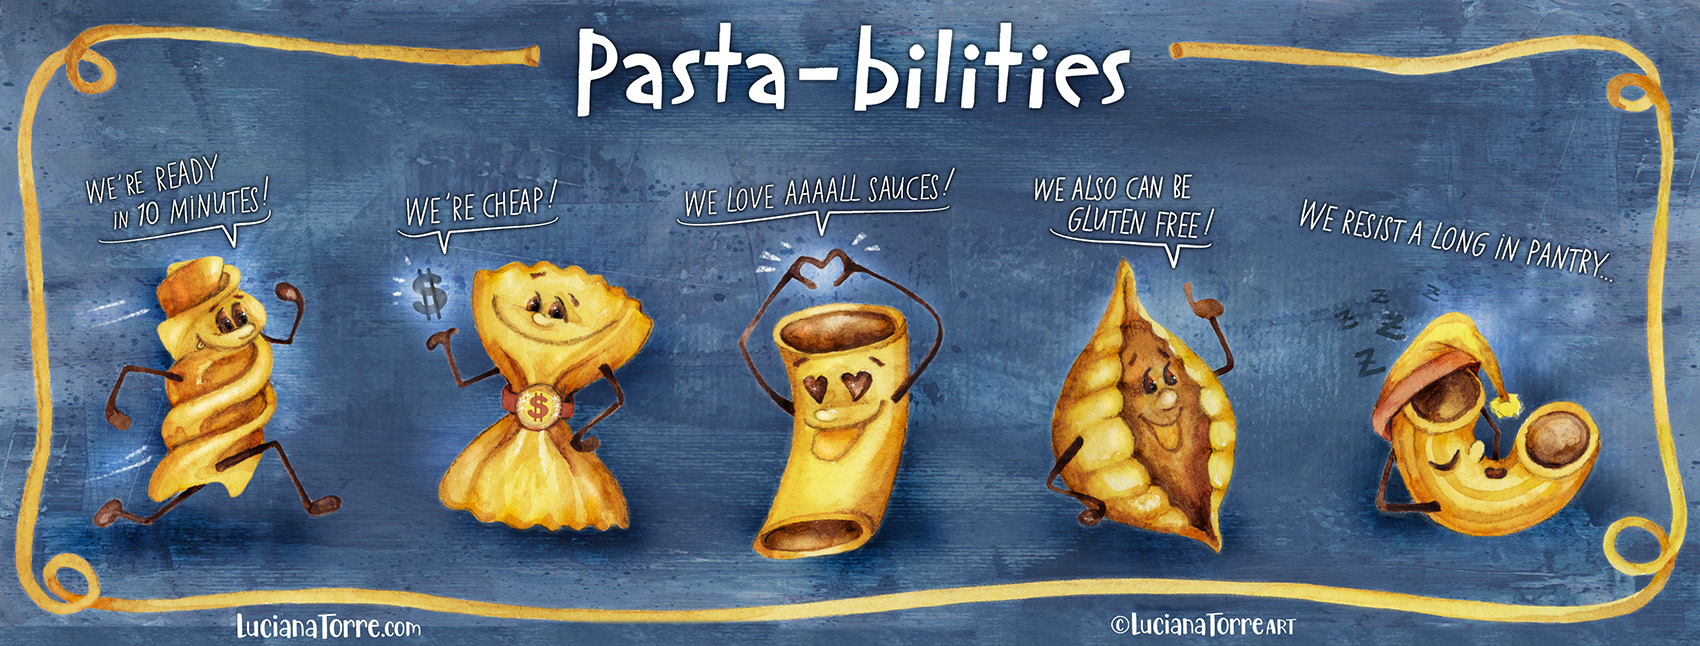 Luciana Torre ART pasta illustration food